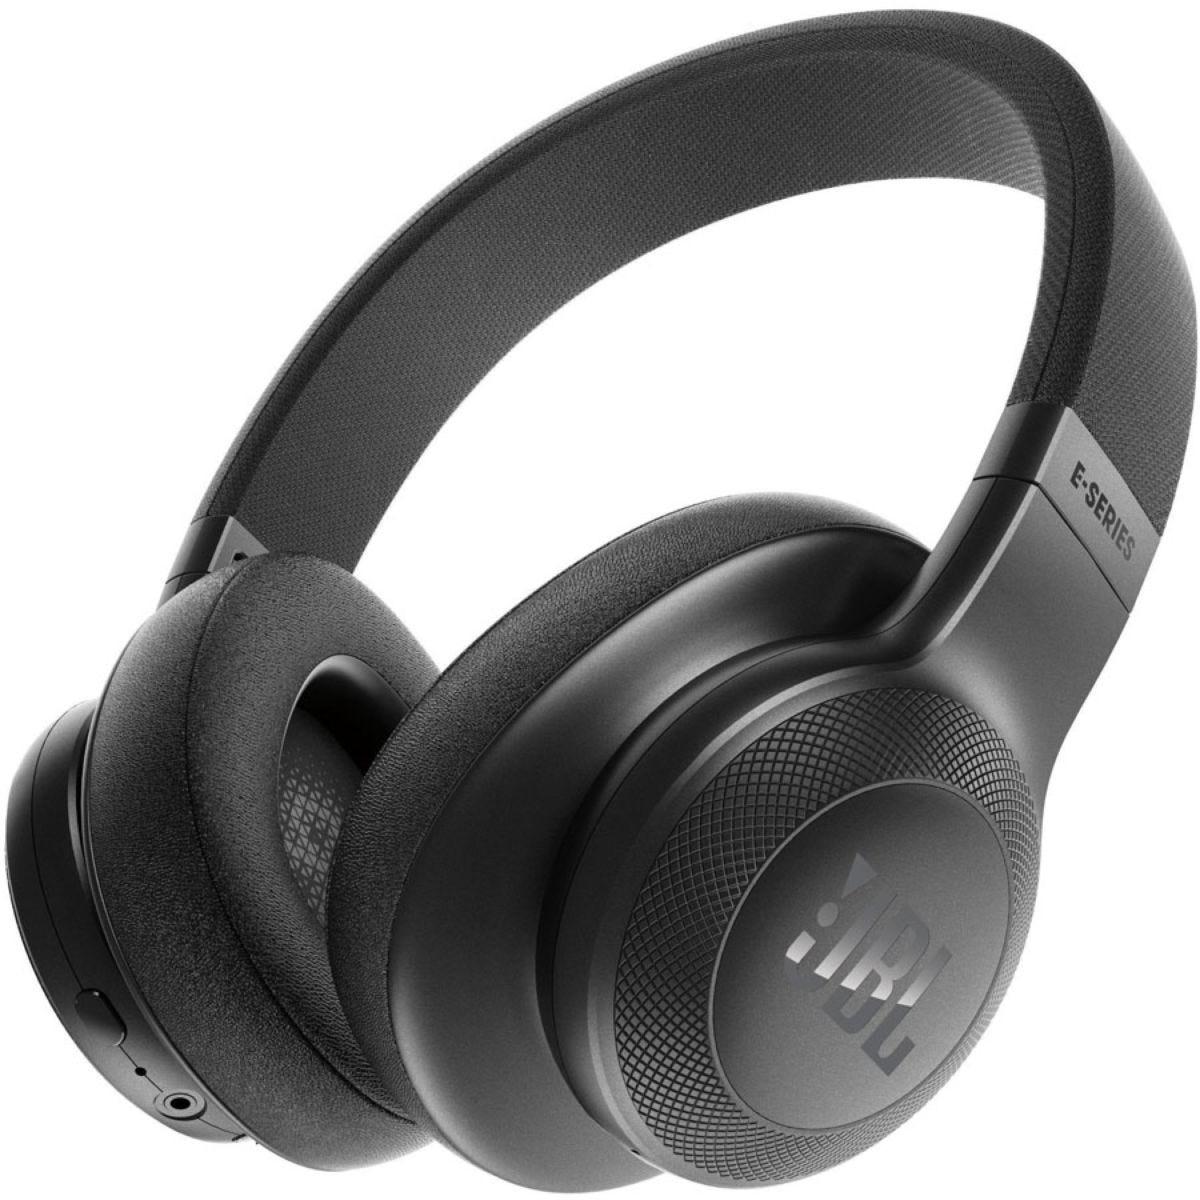 JBL E55BT Bluetooth Headphones - Black